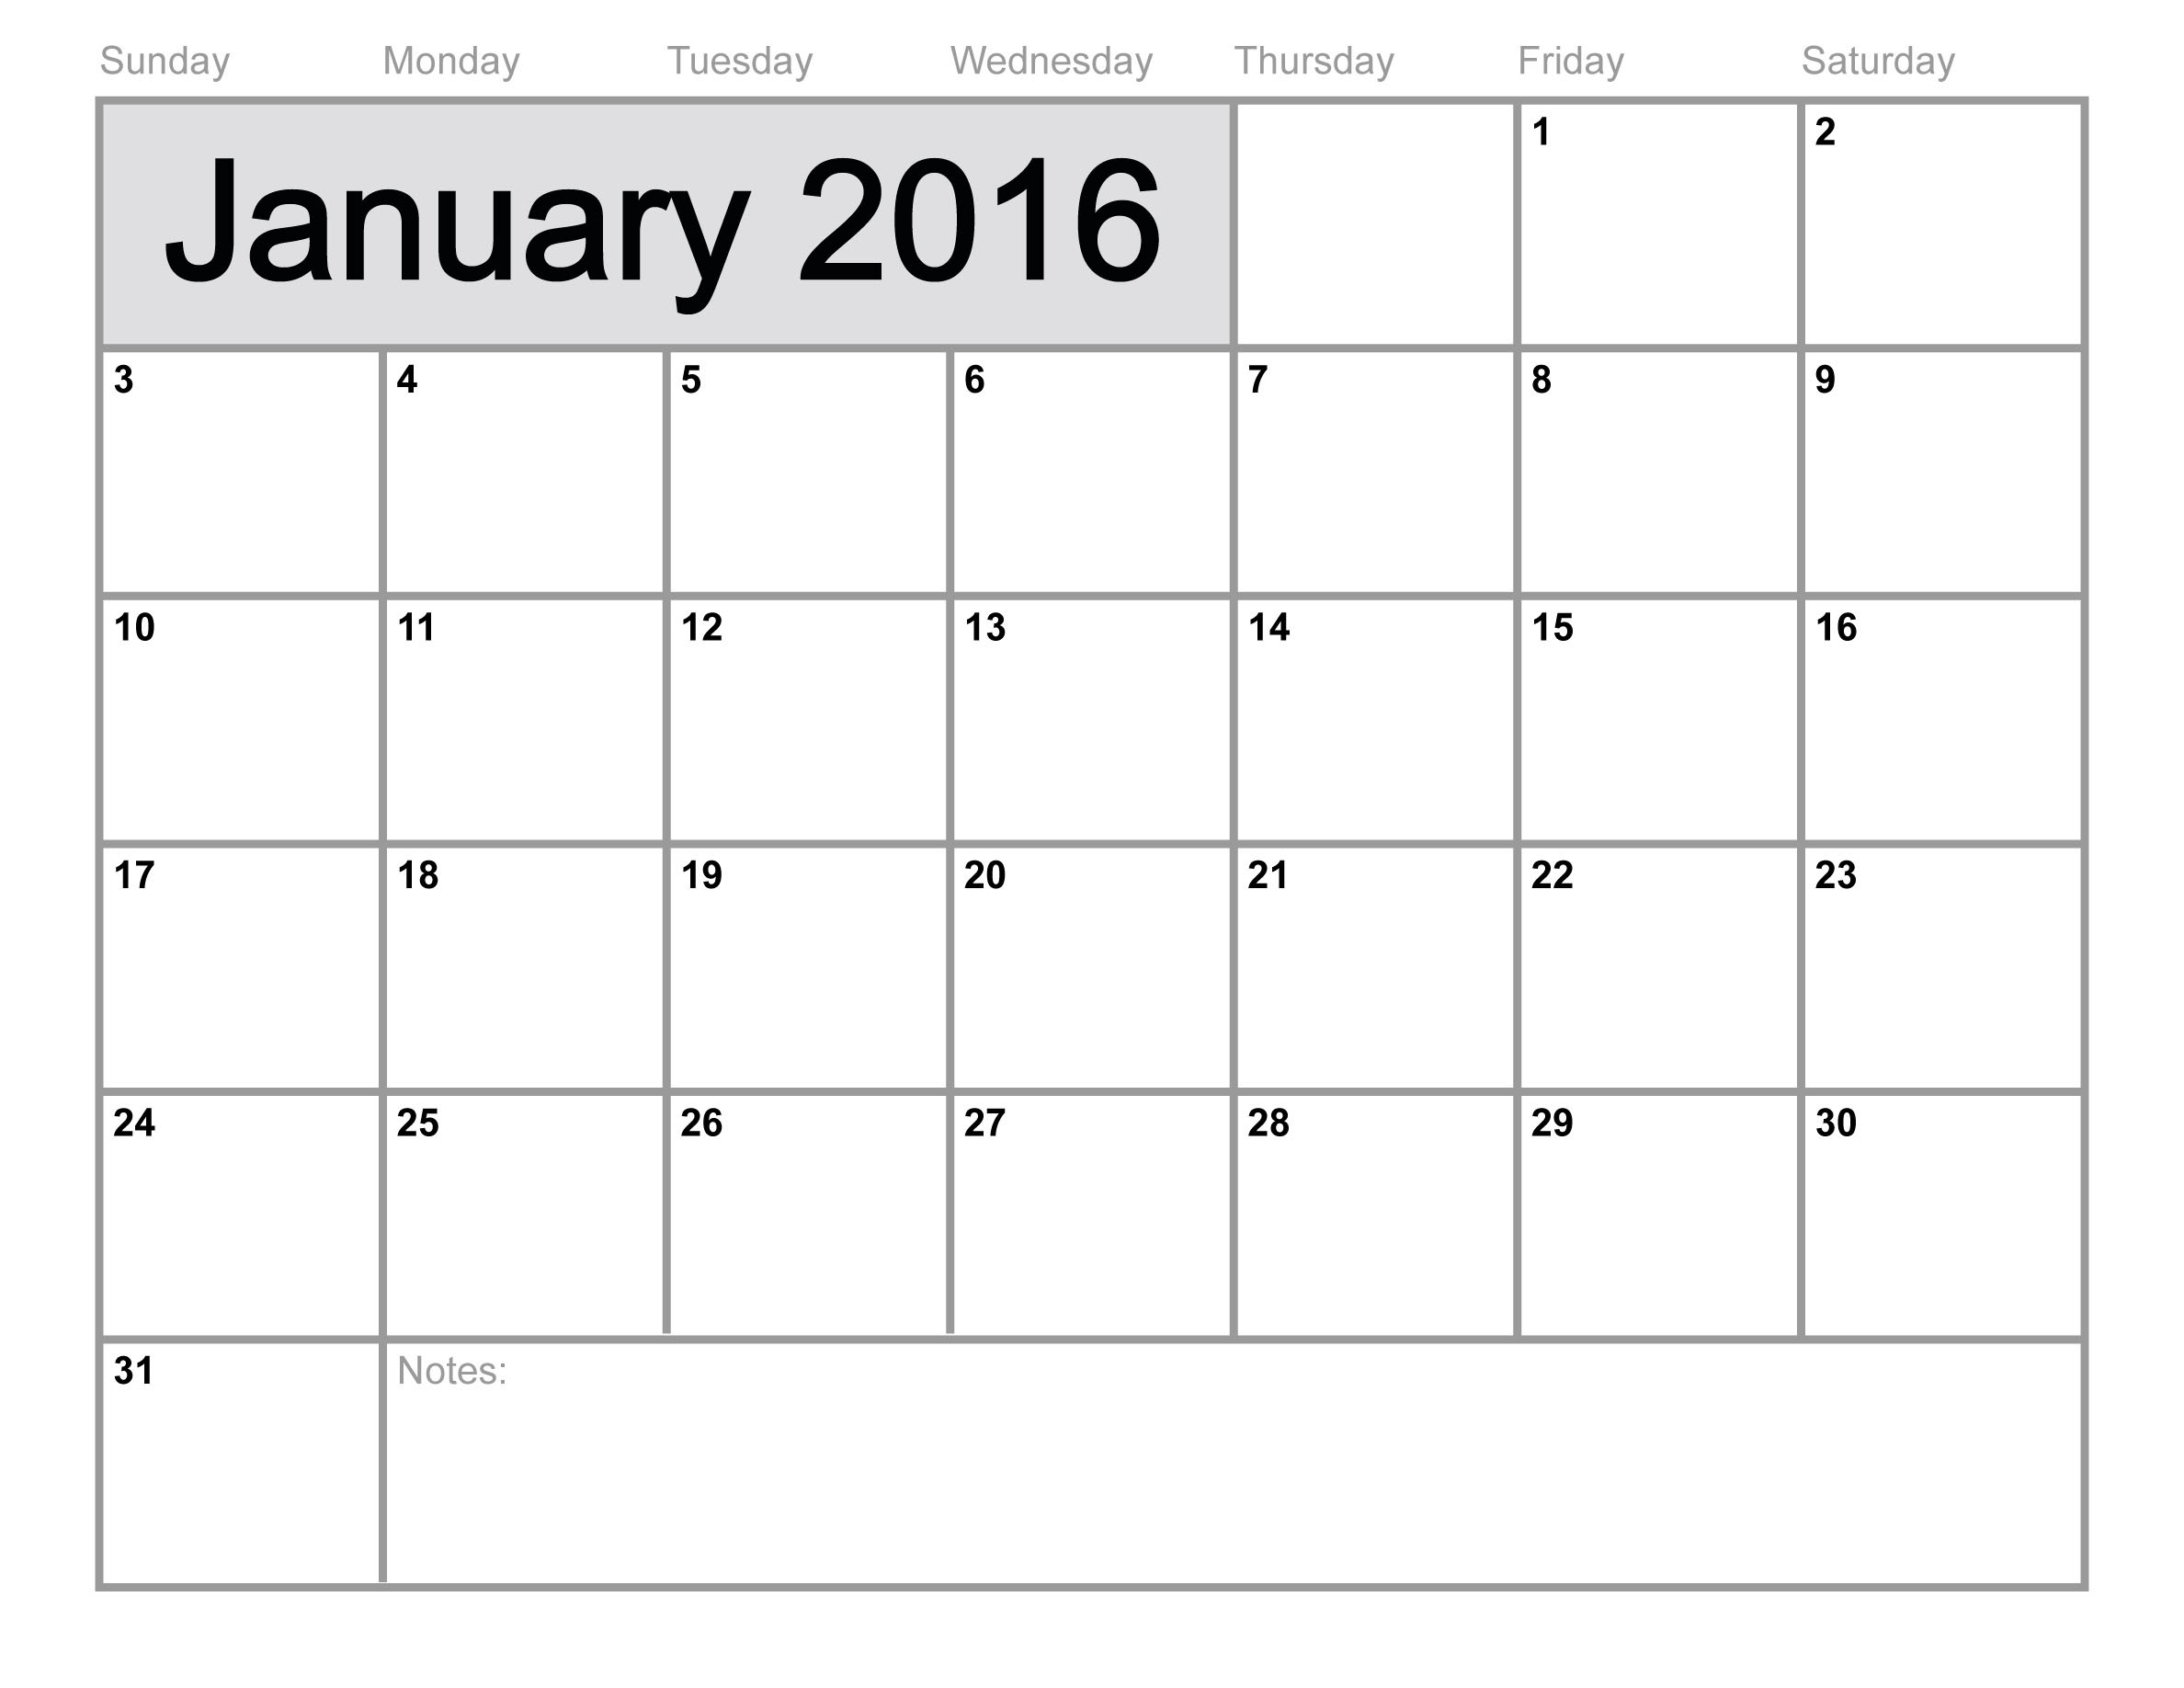 january 2017 printable calendar printable calendar templates rh printablecalendartemplates com january 2018 calendar printable template 2017